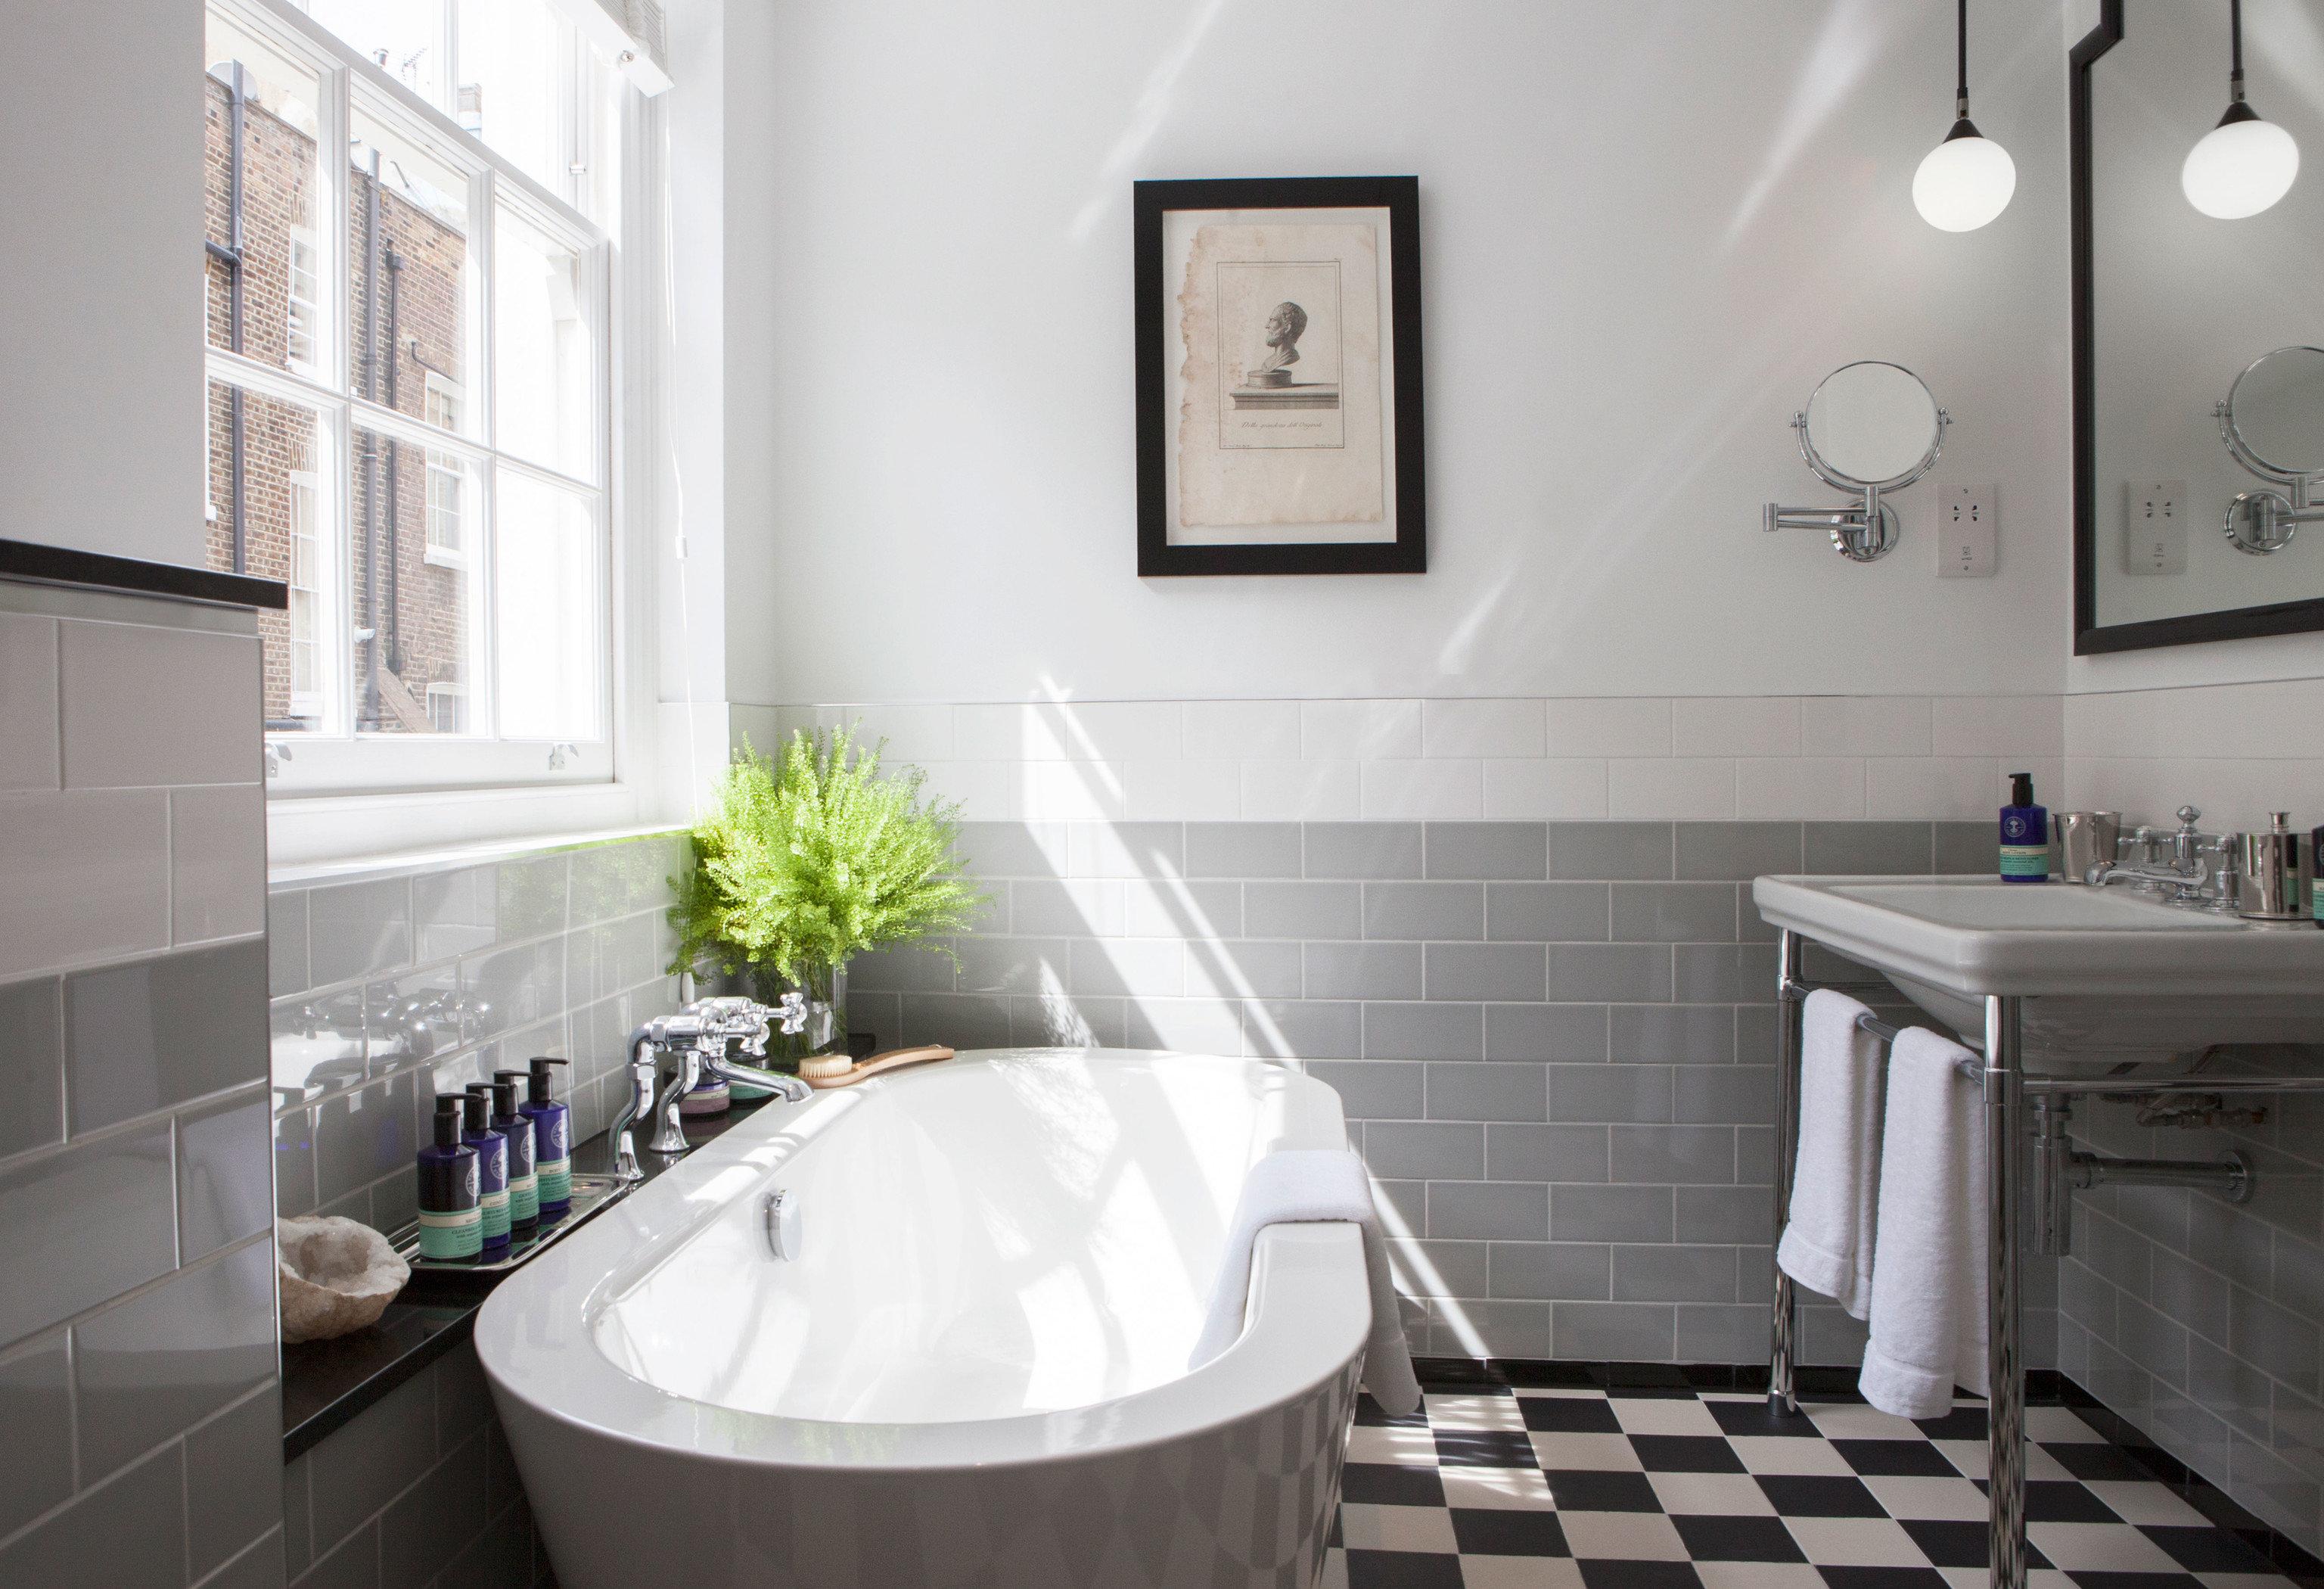 Budget Hotels London bathroom property home white black cottage bathtub tub sink flooring bidet toilet tile Bath tiled